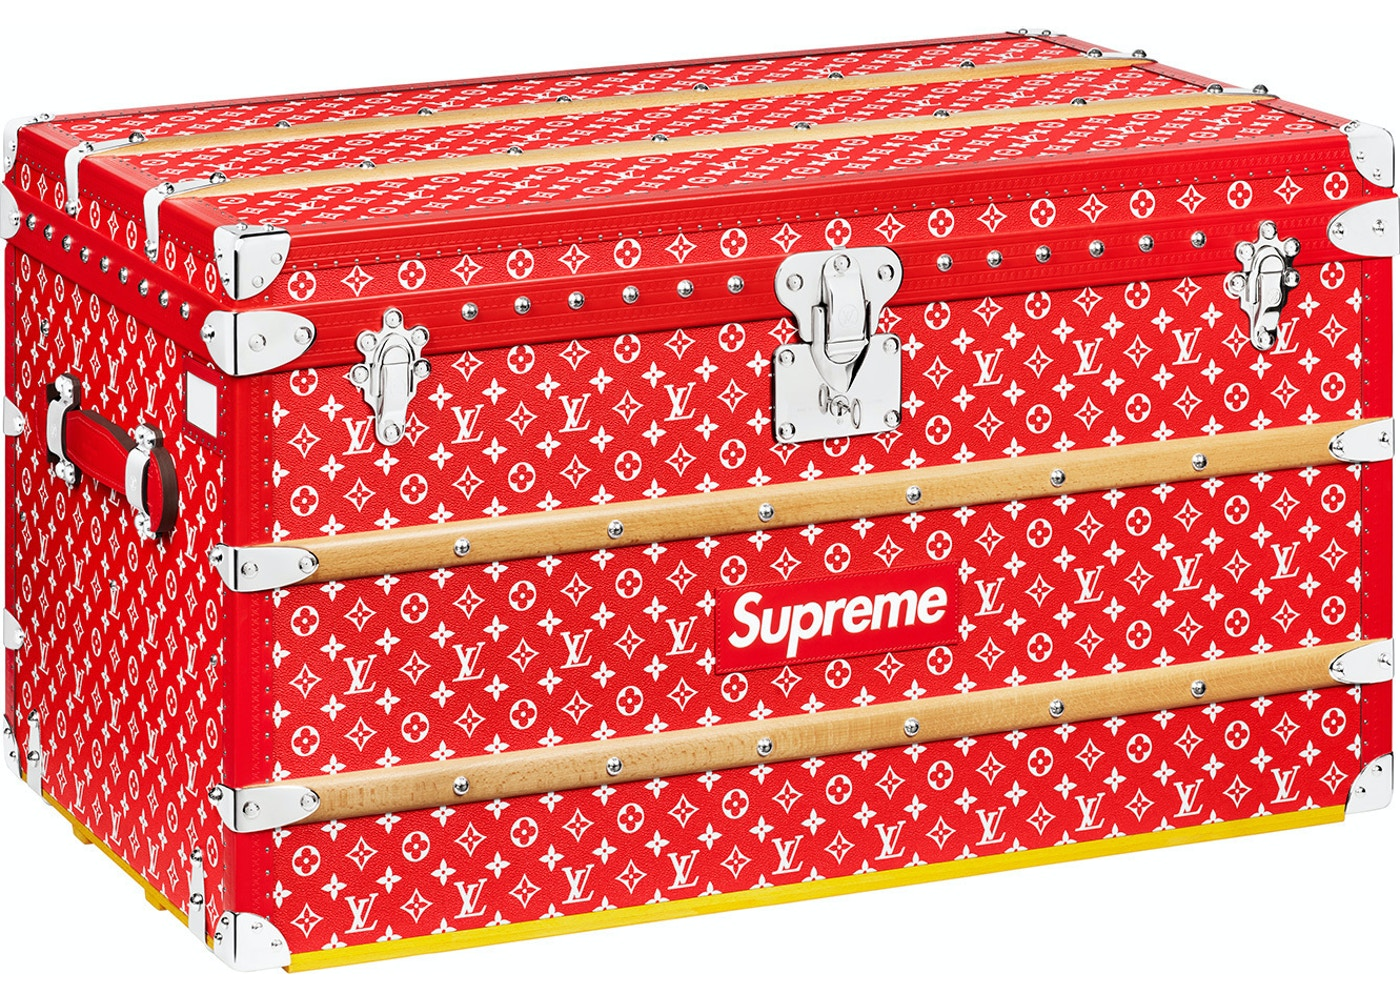 658deb7d80 Louis Vuitton x Supreme Malle Courrier Trunk Monogram 90 Red